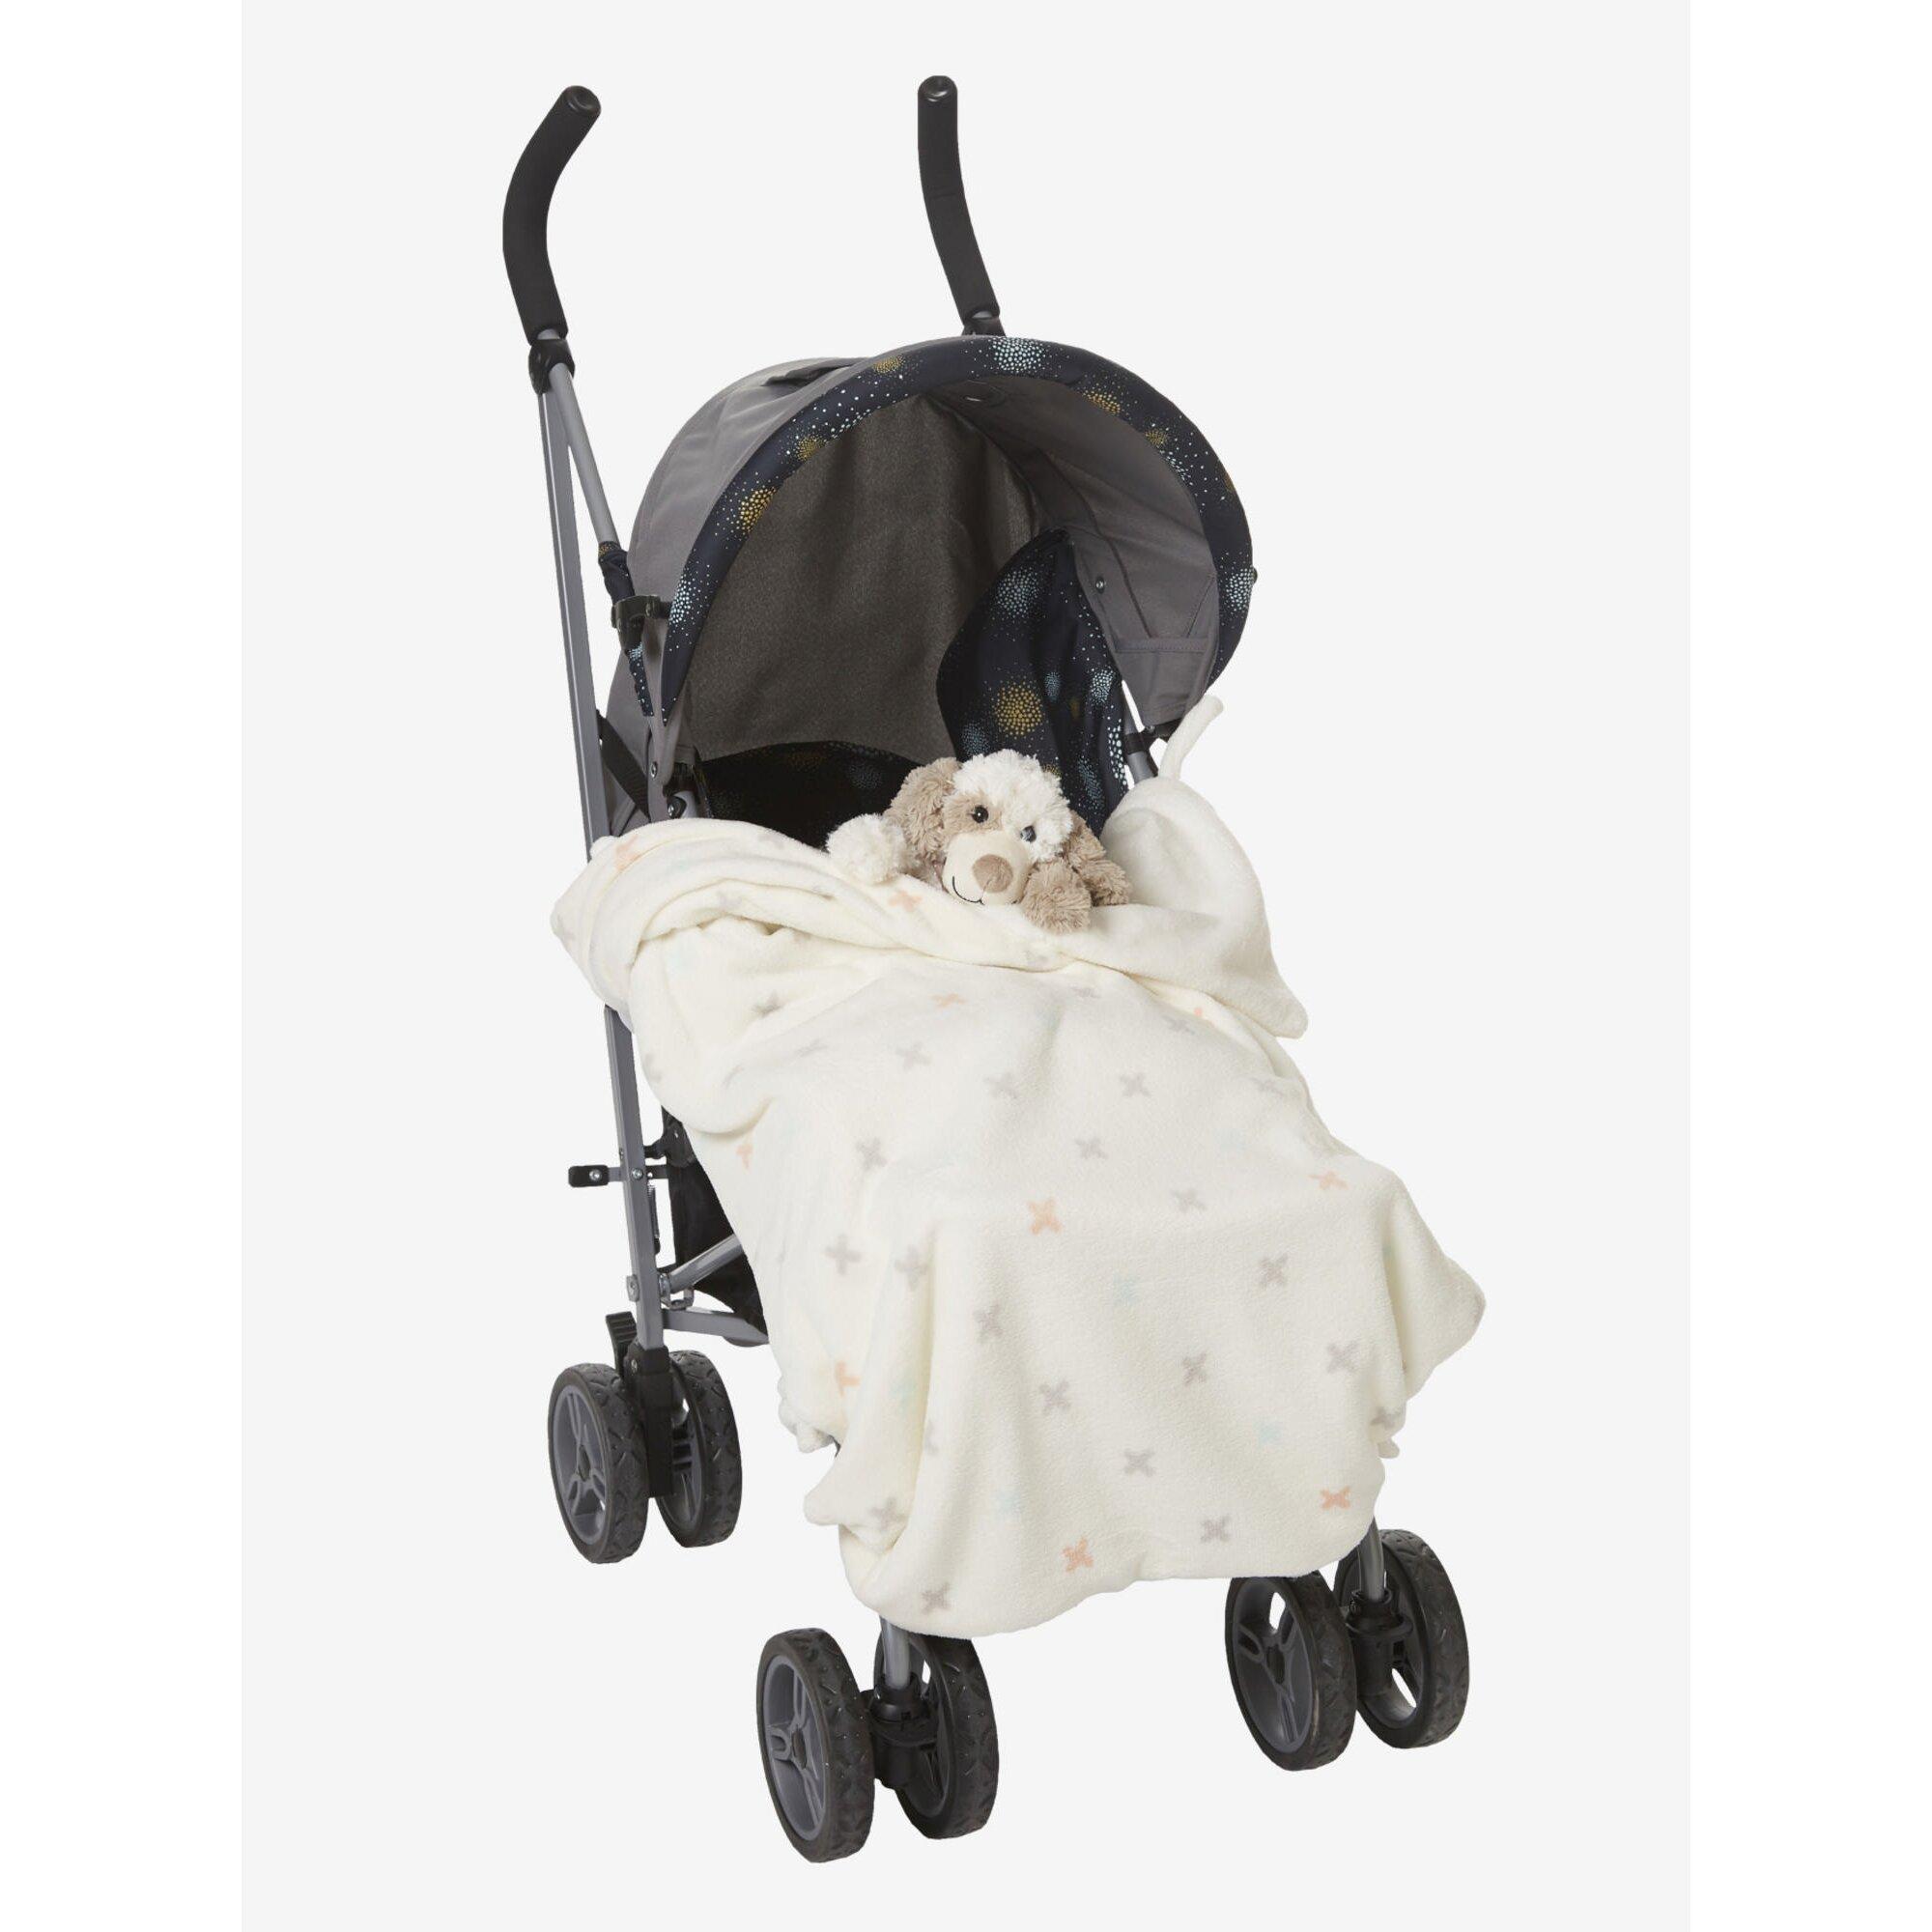 vertbaudet-kuschelige-babydecke-fur-den-buggy-weiss, 13.99 EUR @ babywalz-de